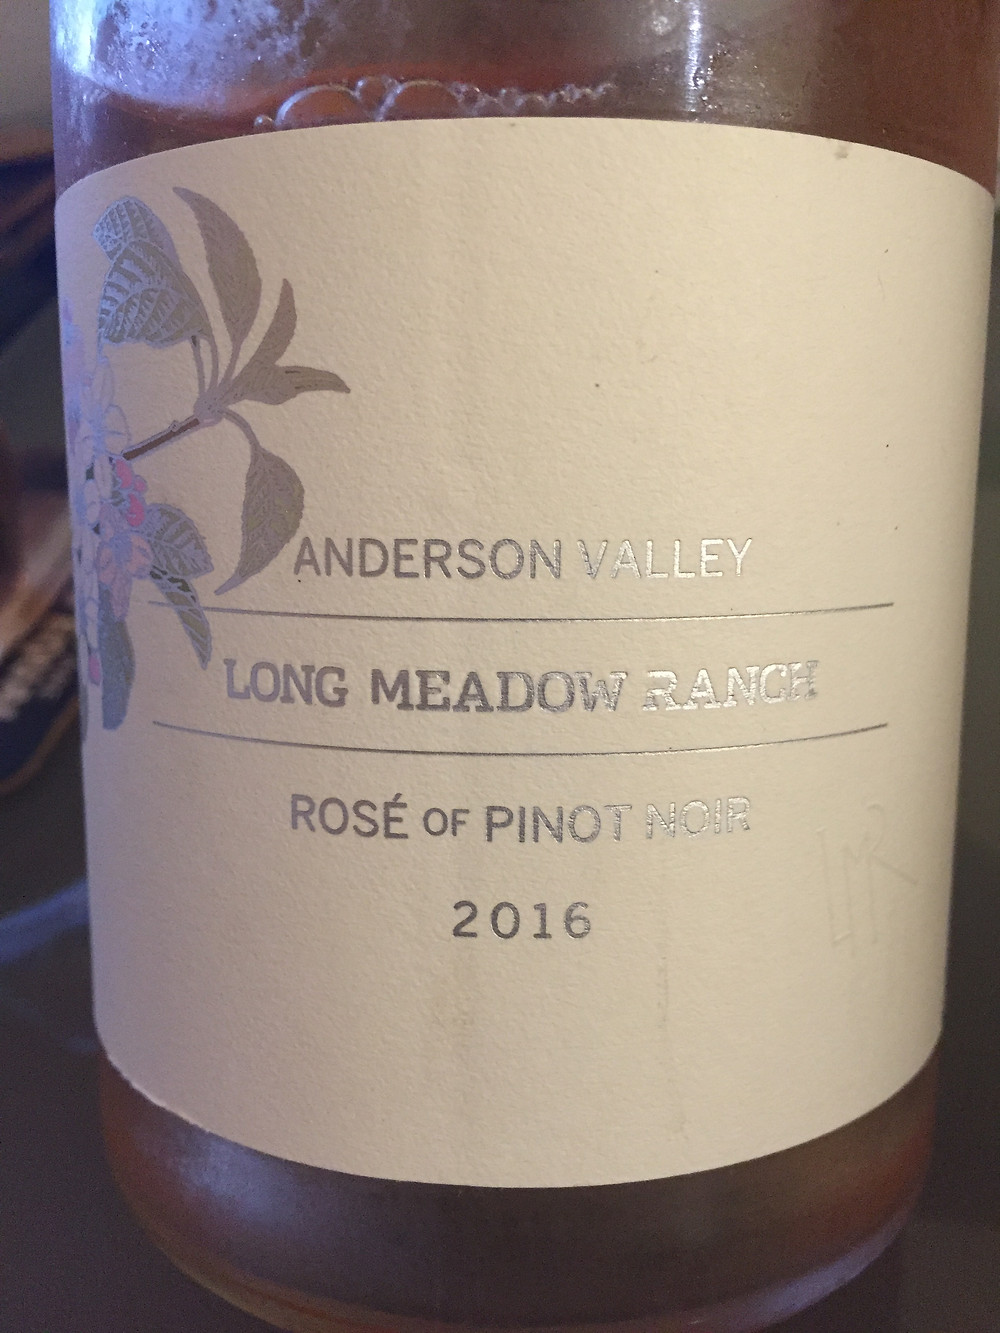 2016 Long Meadow Ranch Rosé of Pinot Noir, Anderson Valley, CA